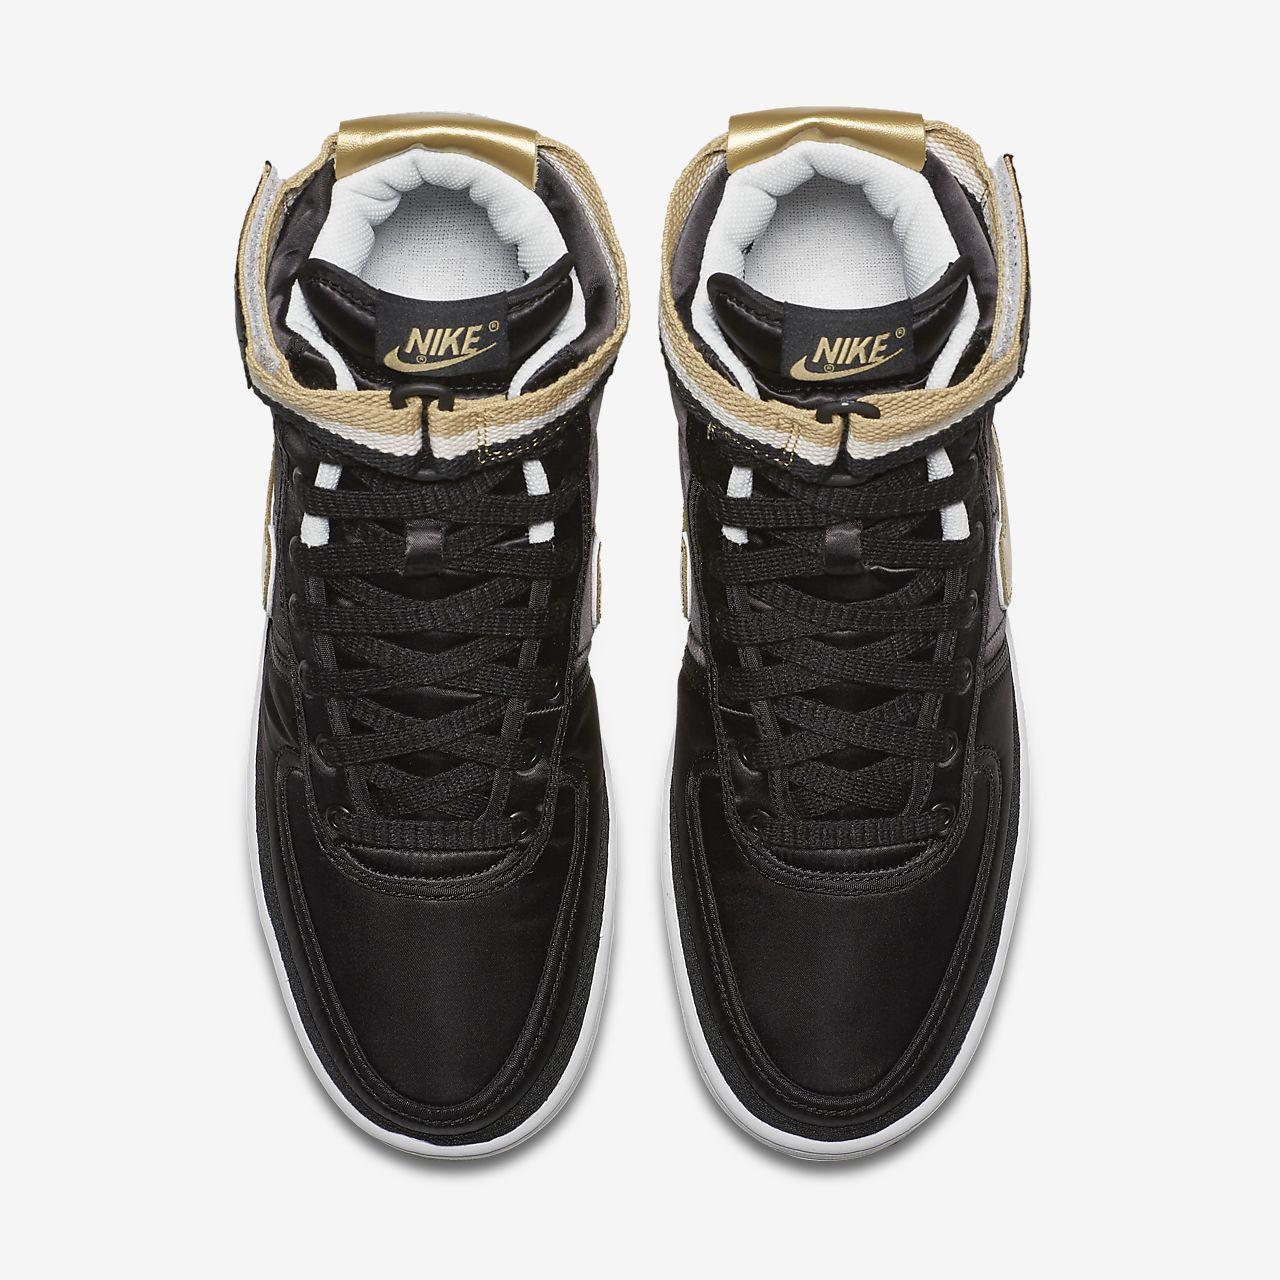 75a2a880fe7 Nike Vandal High Supreme QS Men s Shoe. Nike.com